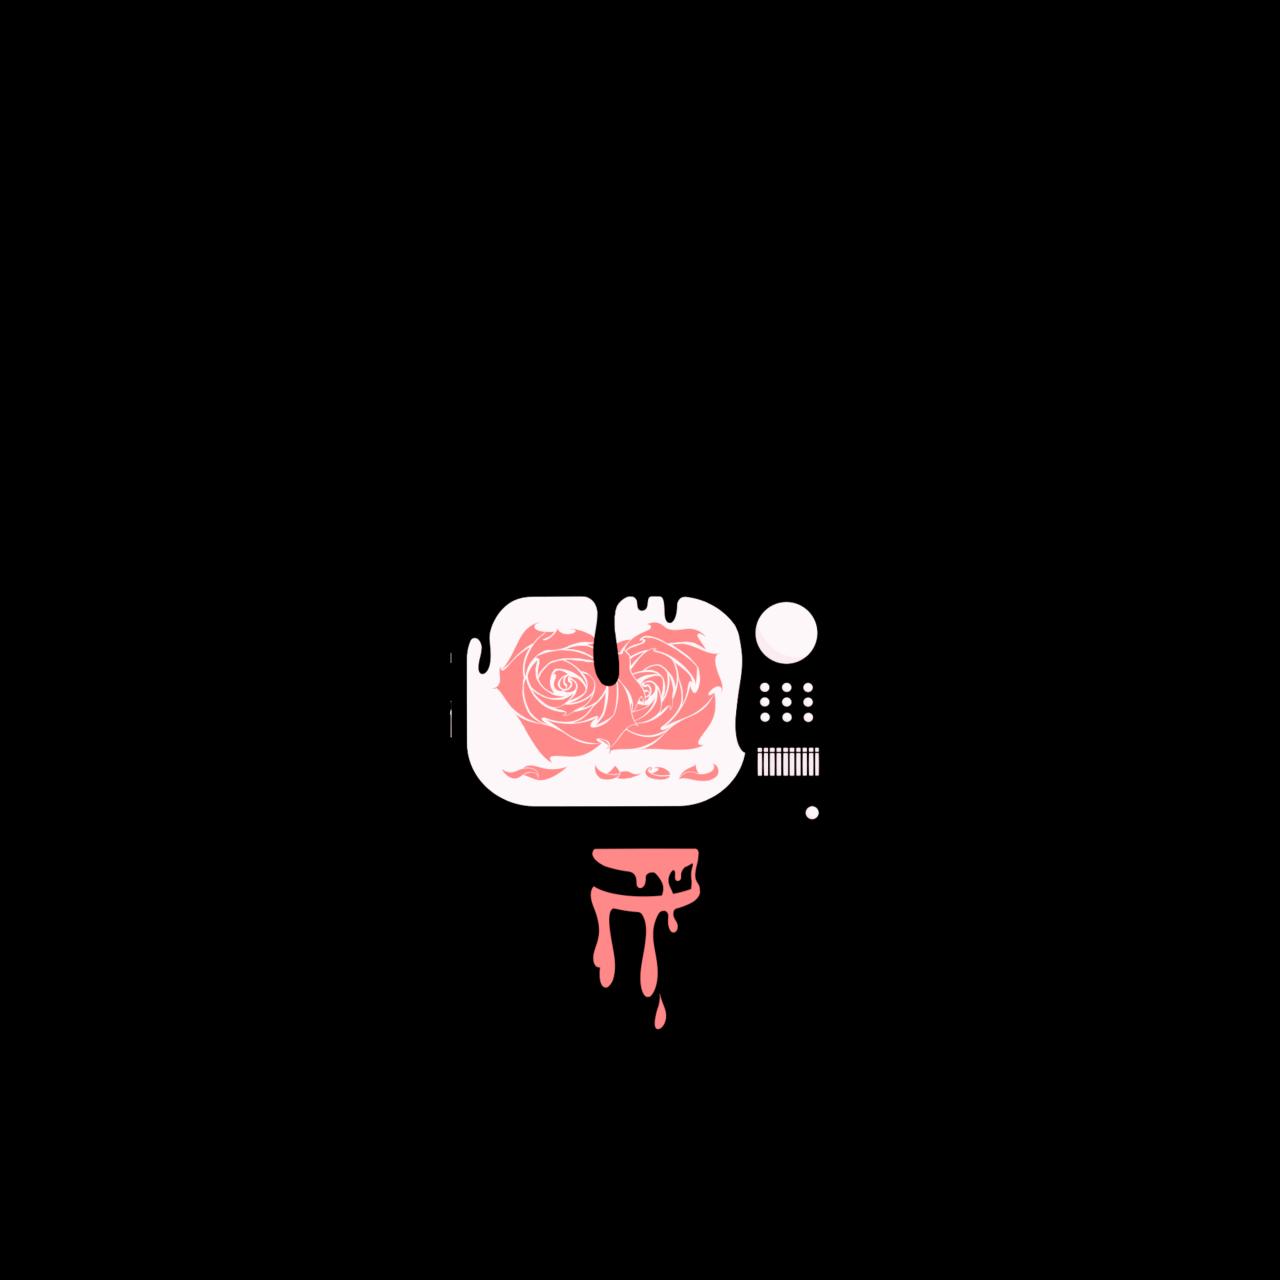 OBJECT HEADS | Object heads, Creepy art, Tv head